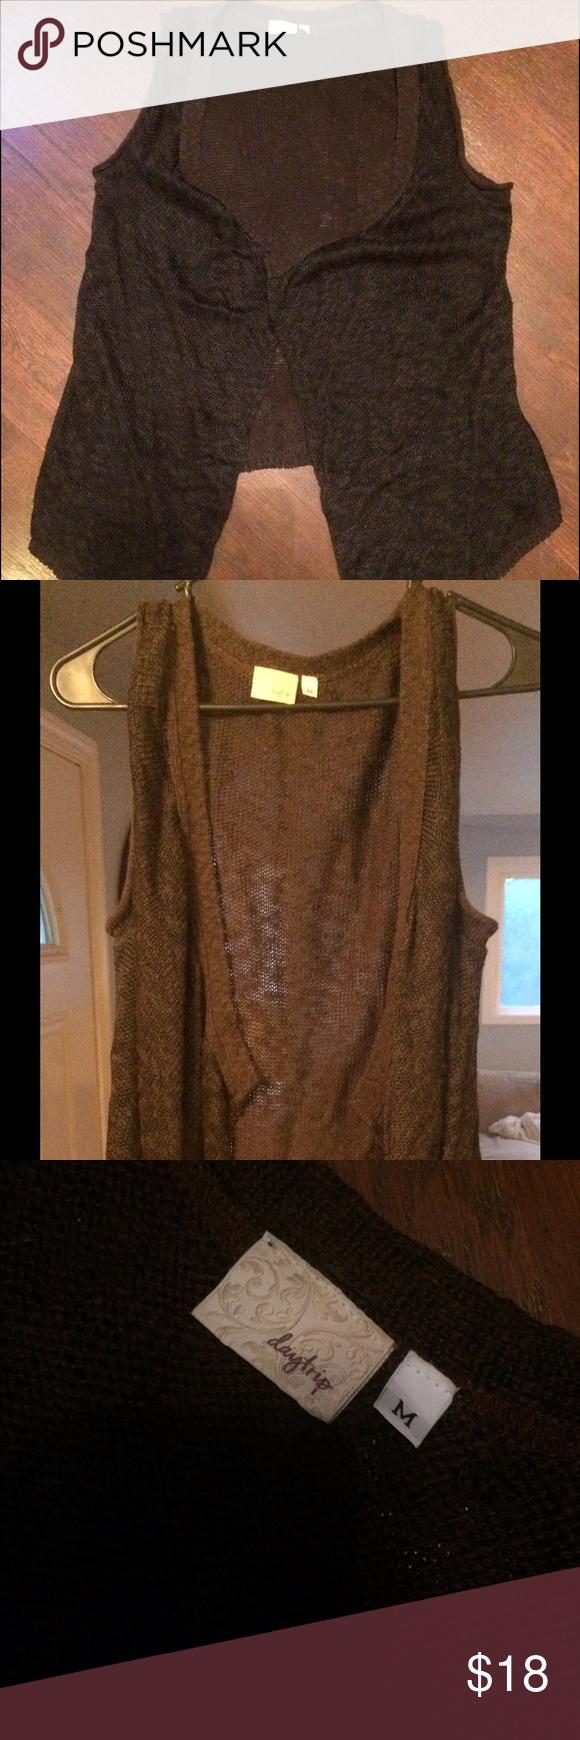 Sleeveless Cardigan two toned sleeveless brown cardigan. Rarely worn. Daytrip Sweaters Cardigans